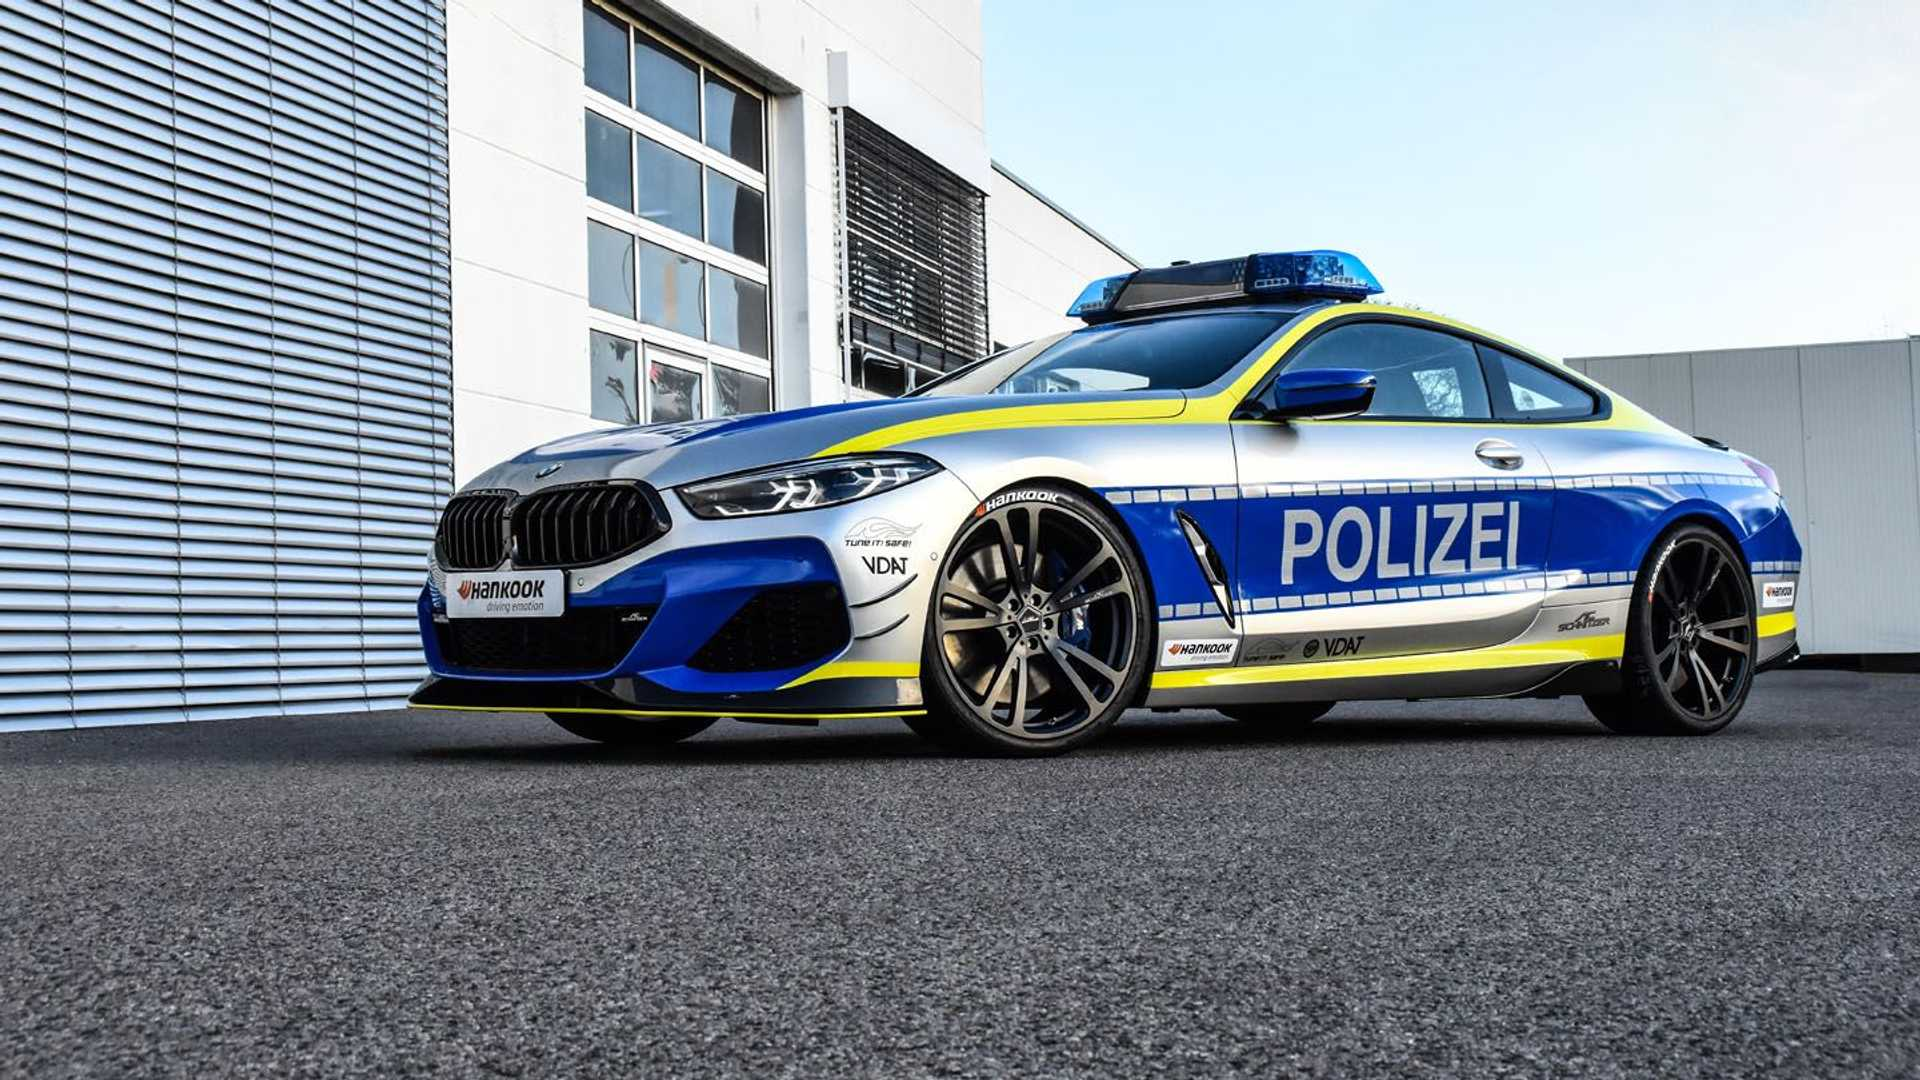 BMW-M850i-police-car-tune-it-safe-13